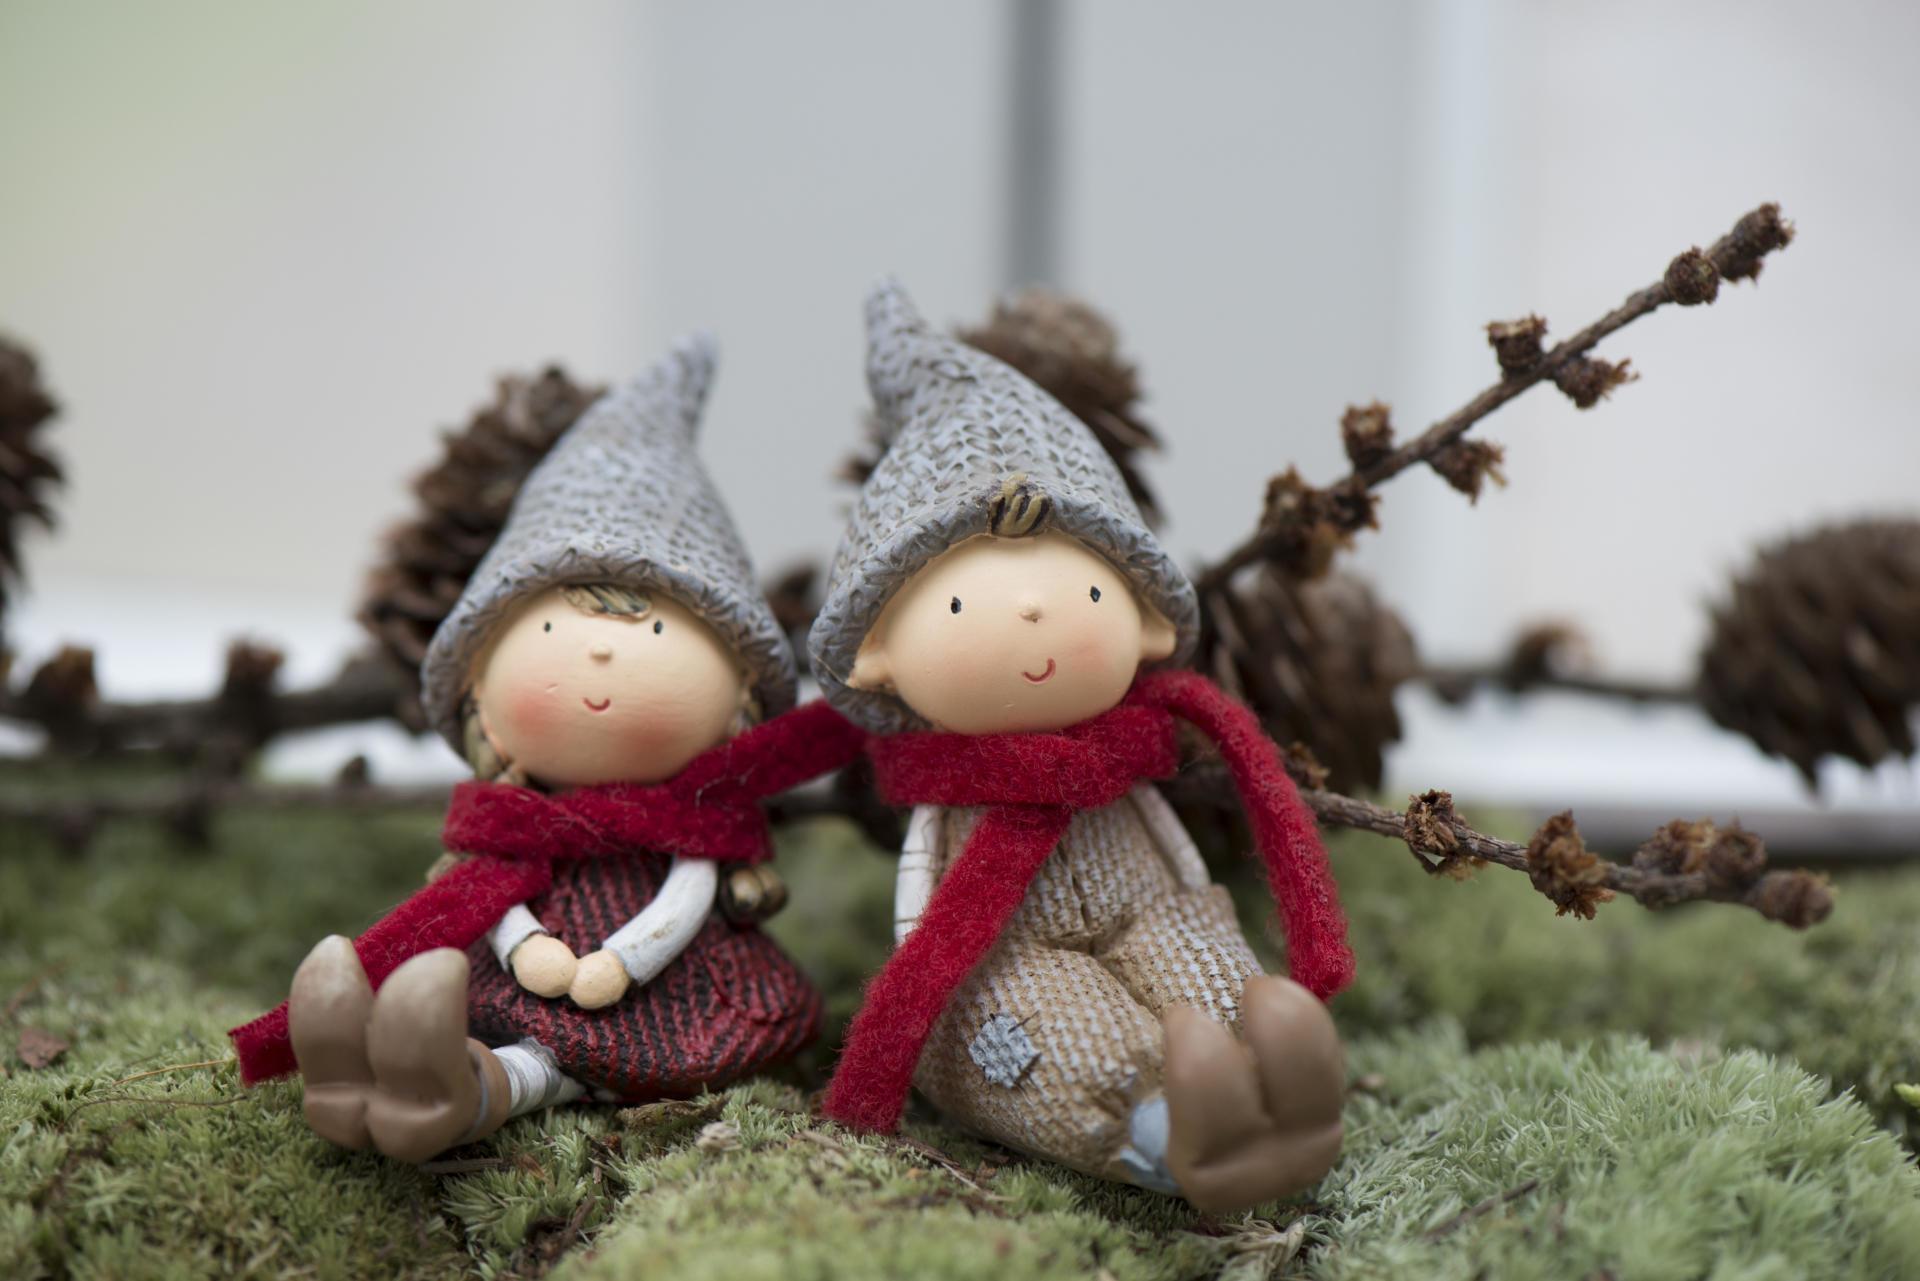 IB LAURSEN Vánoční figurka Santa's helper Kluk, červená barva, šedá barva, hnědá barva, pryskyřice